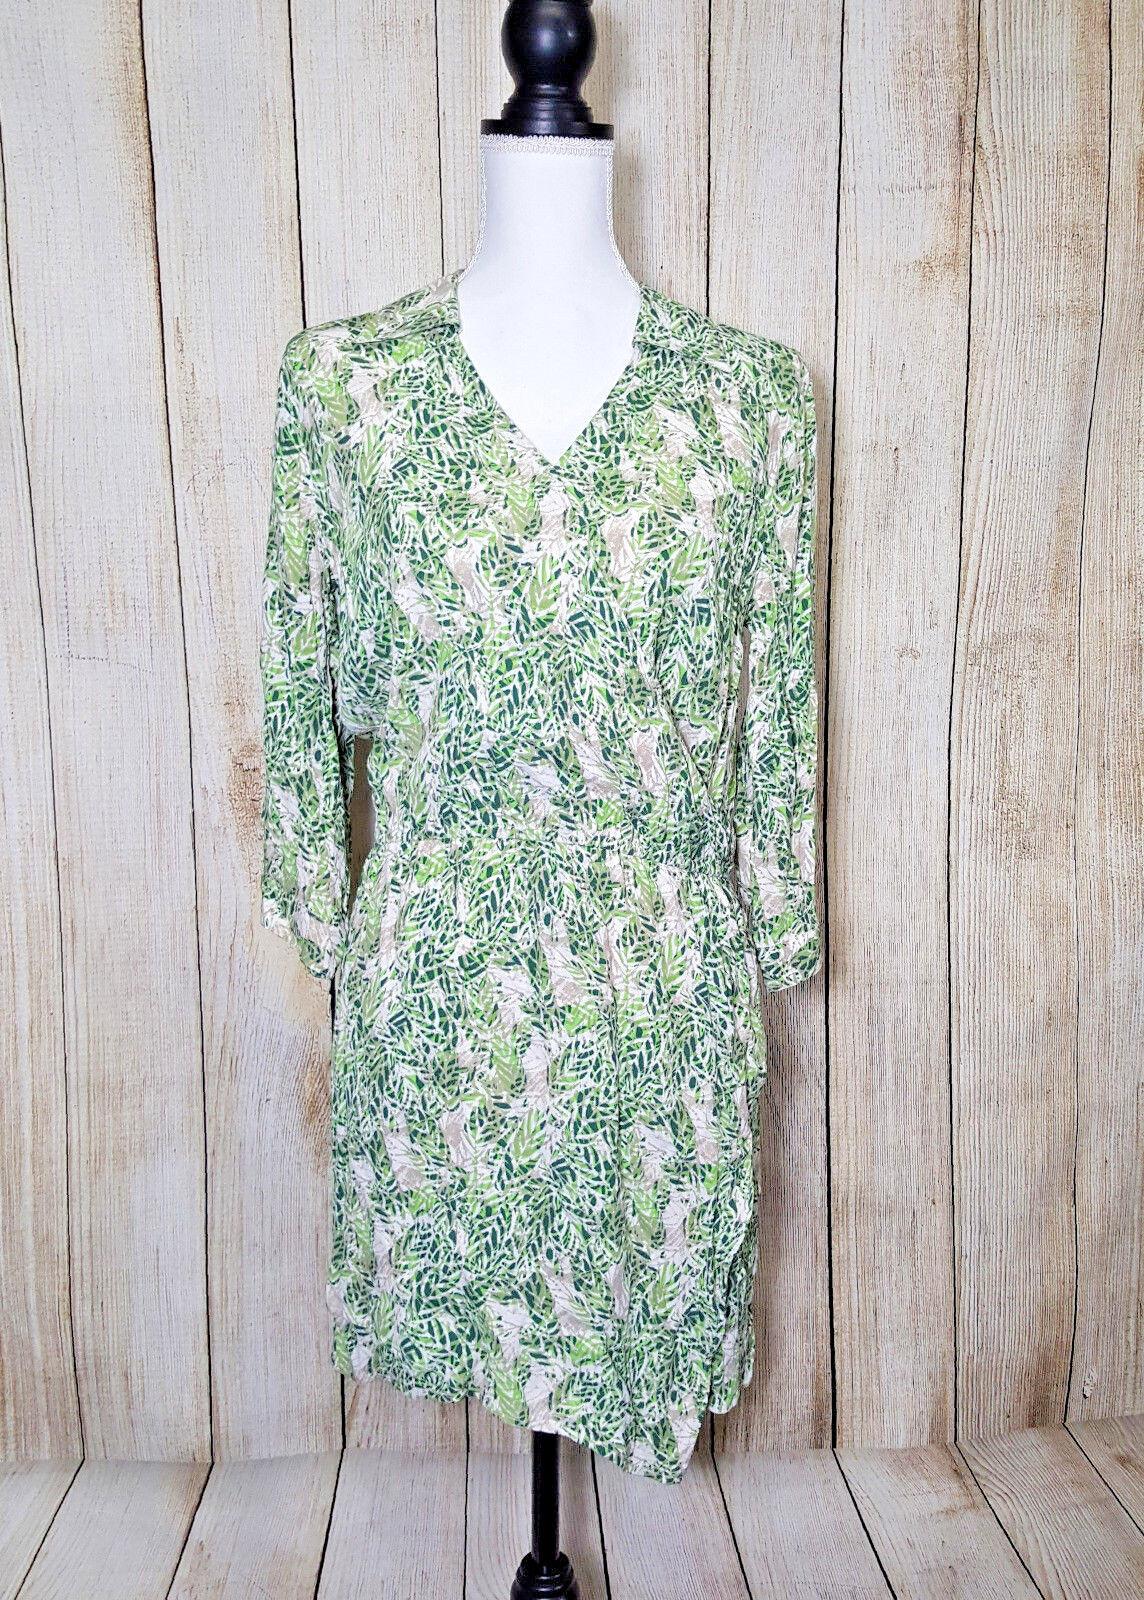 Cabi Womens Dress Faux Wrap Collared Elastic Waist Leaf Print Green Size Small